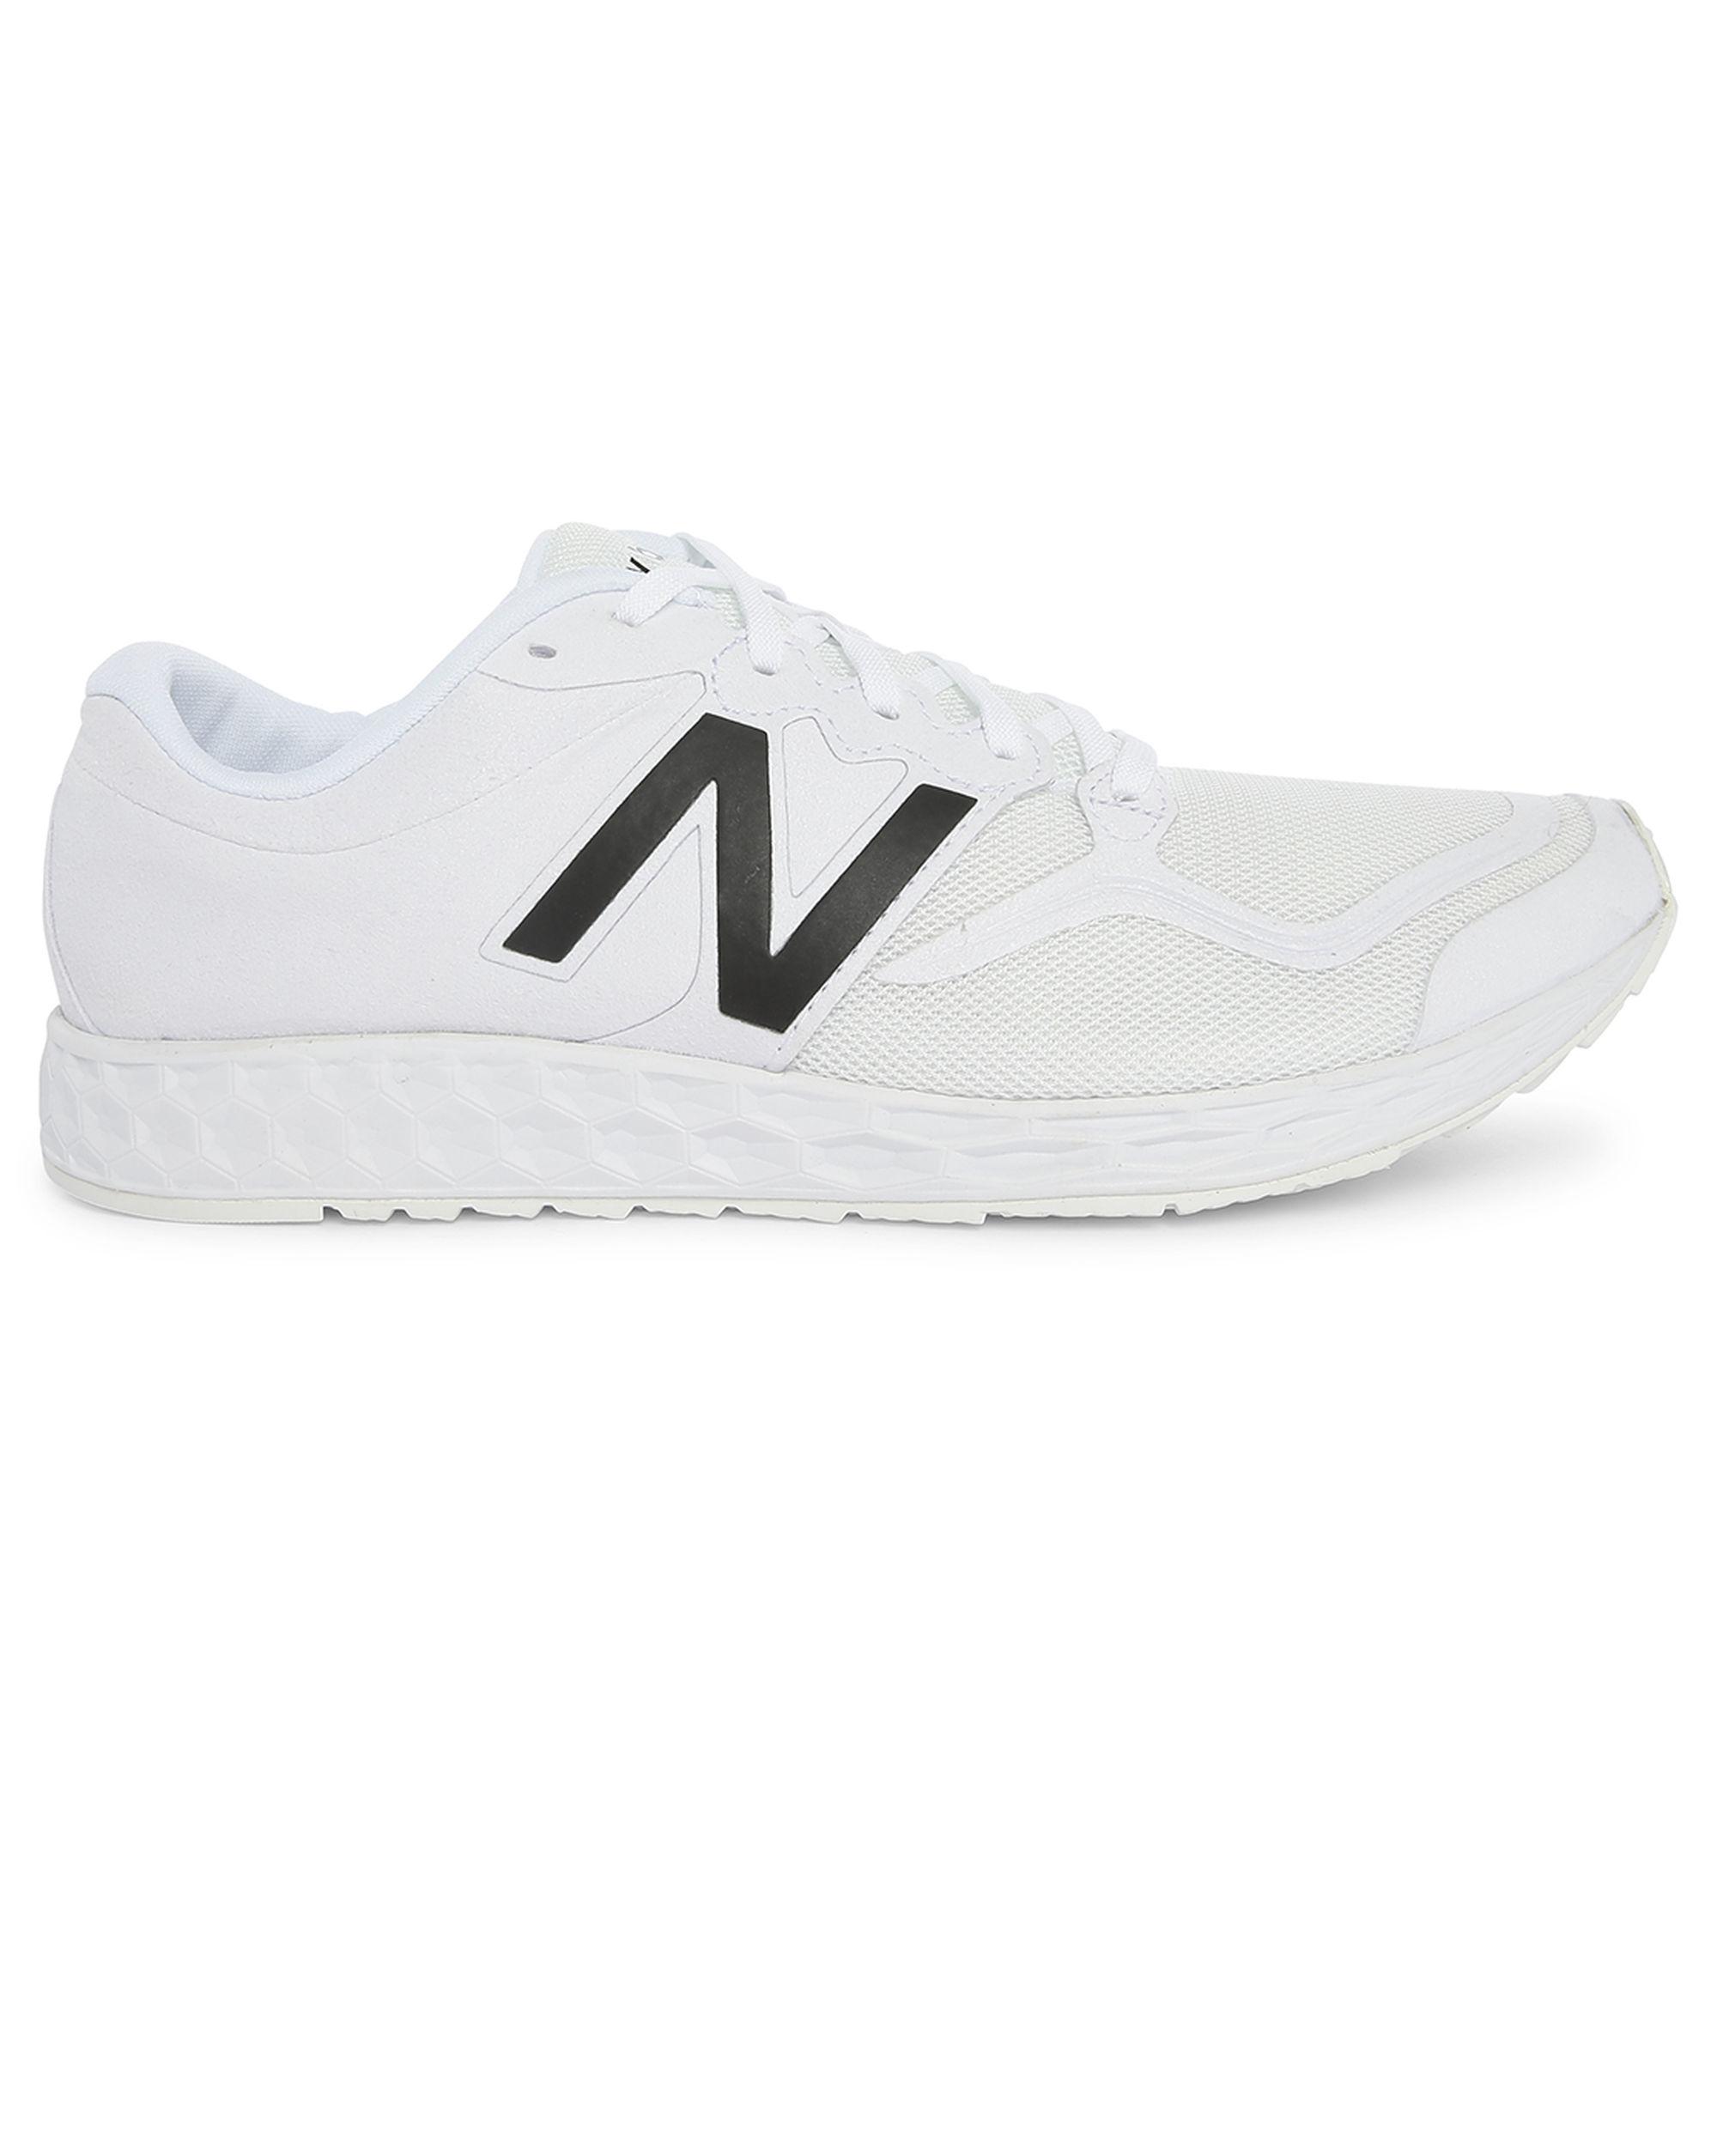 New Balance White 1980 Mesh Sneakers In White For Men Lyst